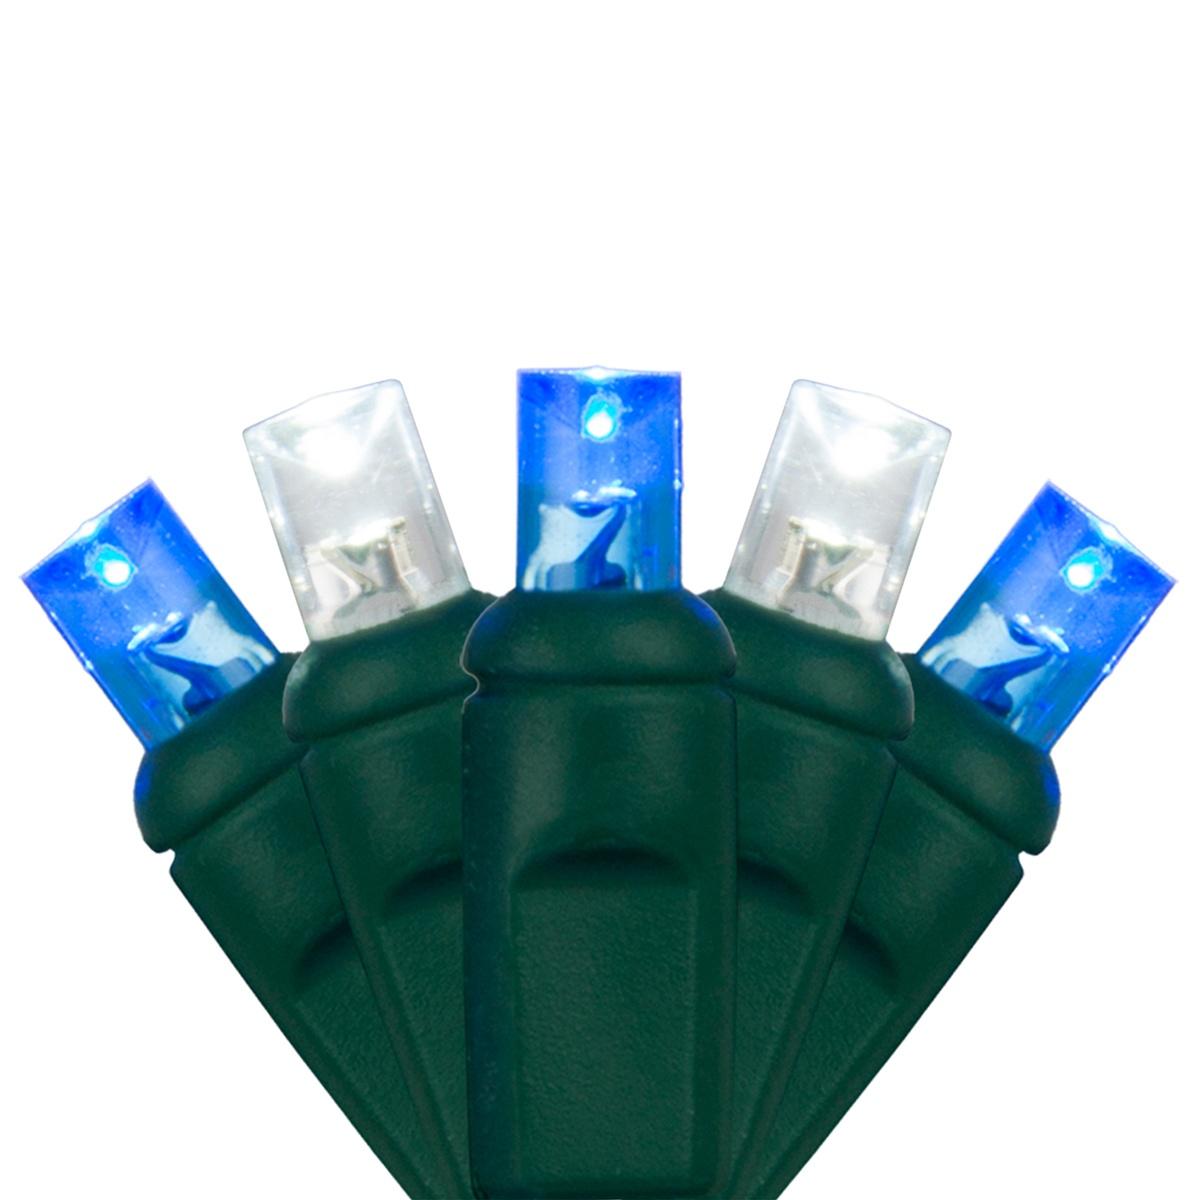 Wide Angle 5MM LED Lights - 70 5mm Blue, Cool White LED Christmas ...